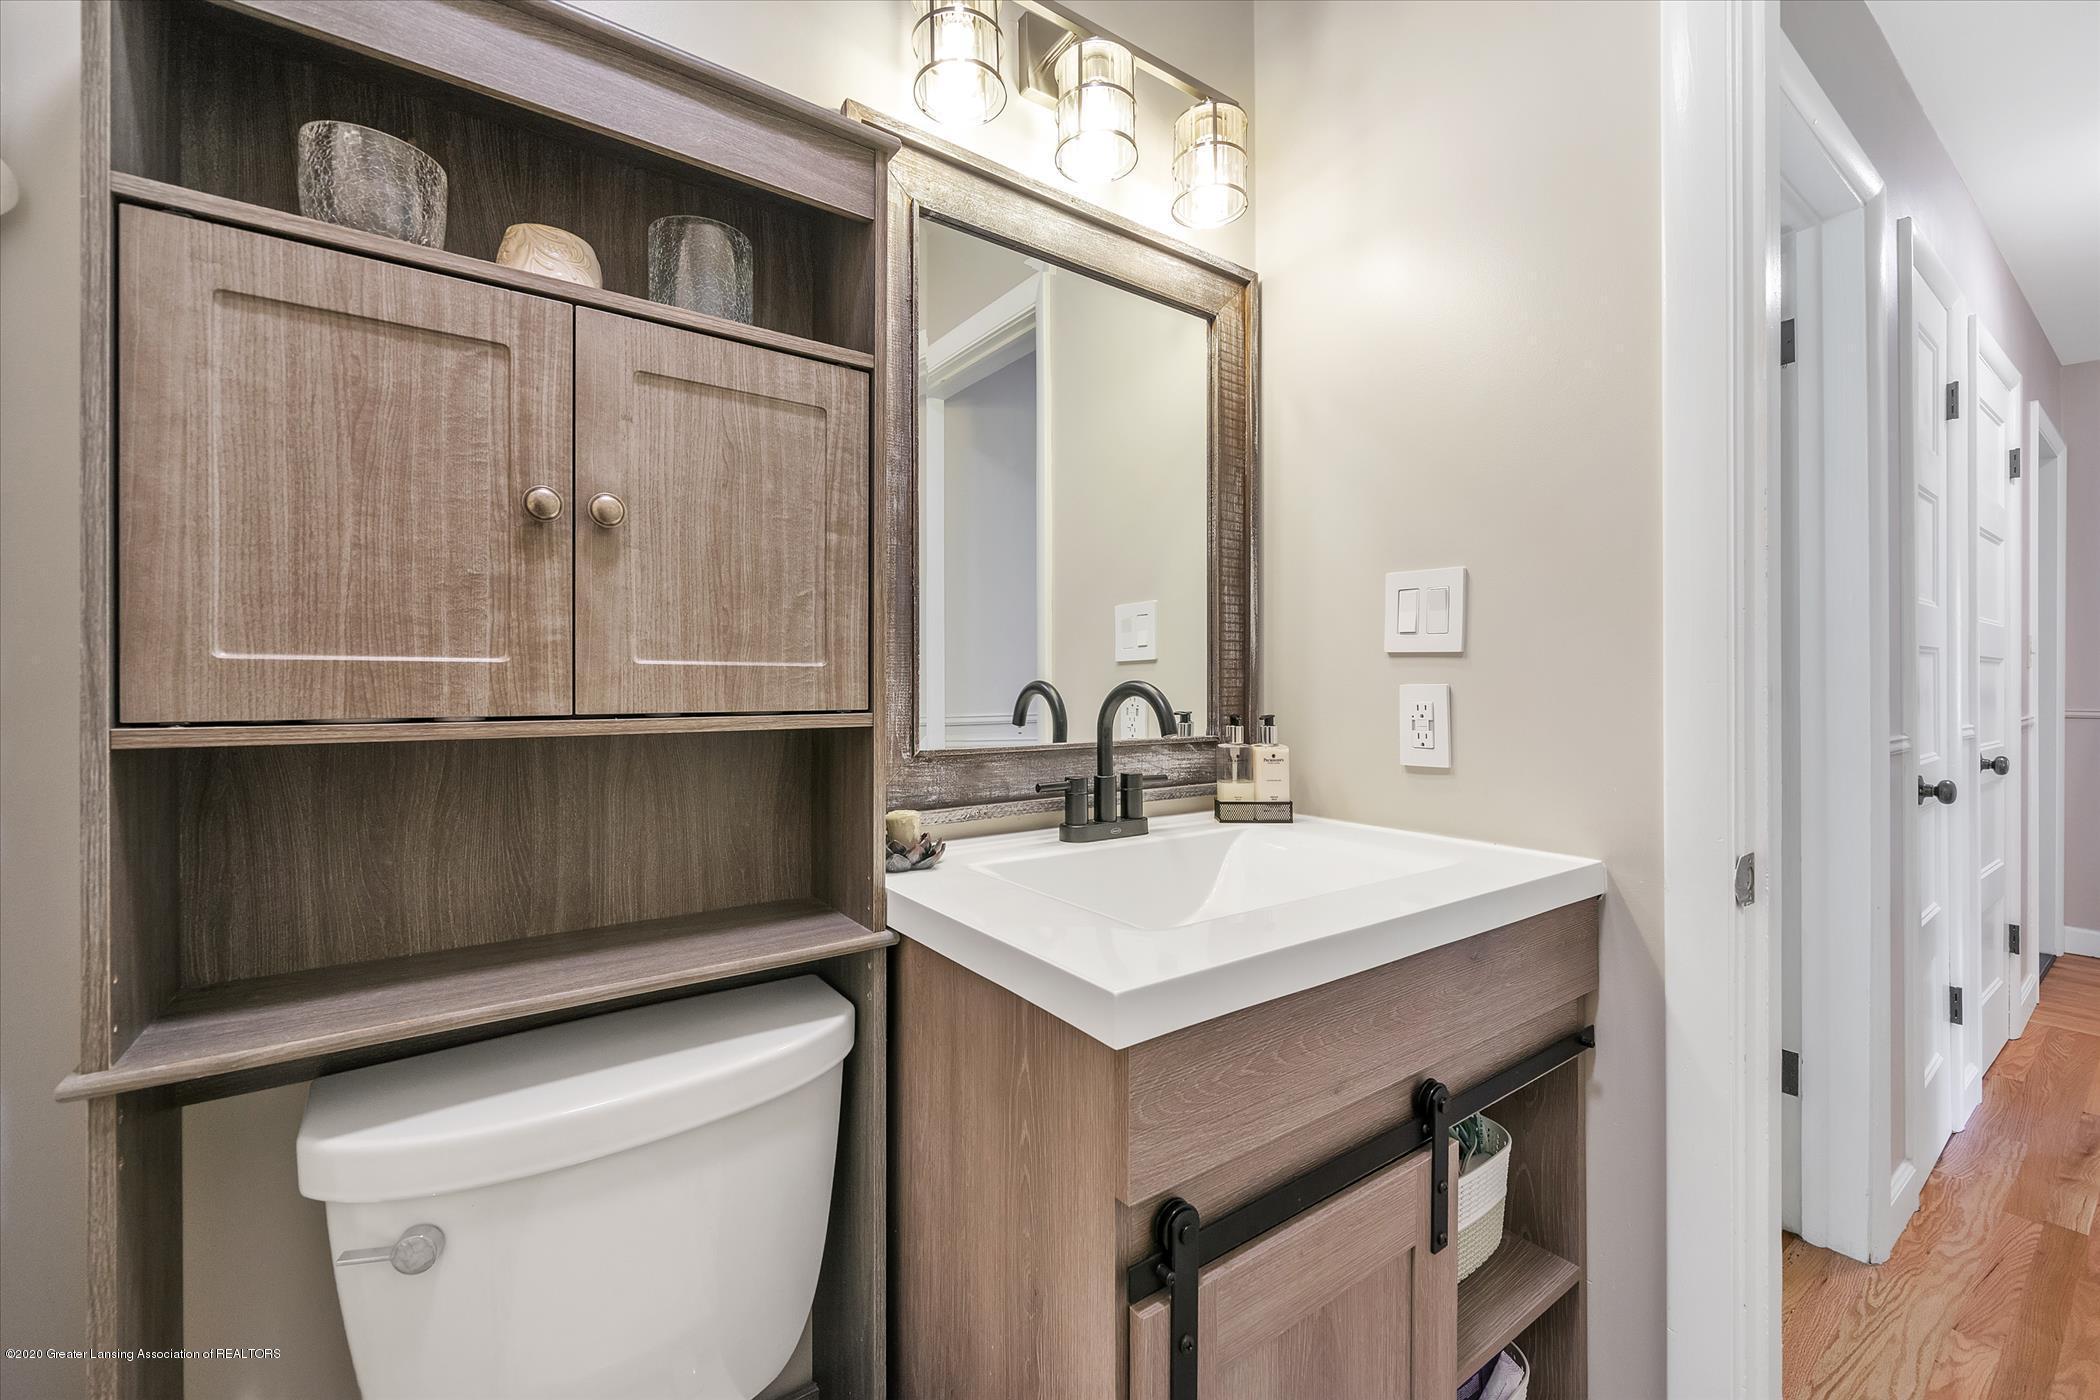 3087 Sandhill Rd - Bathroom view 2 - 14